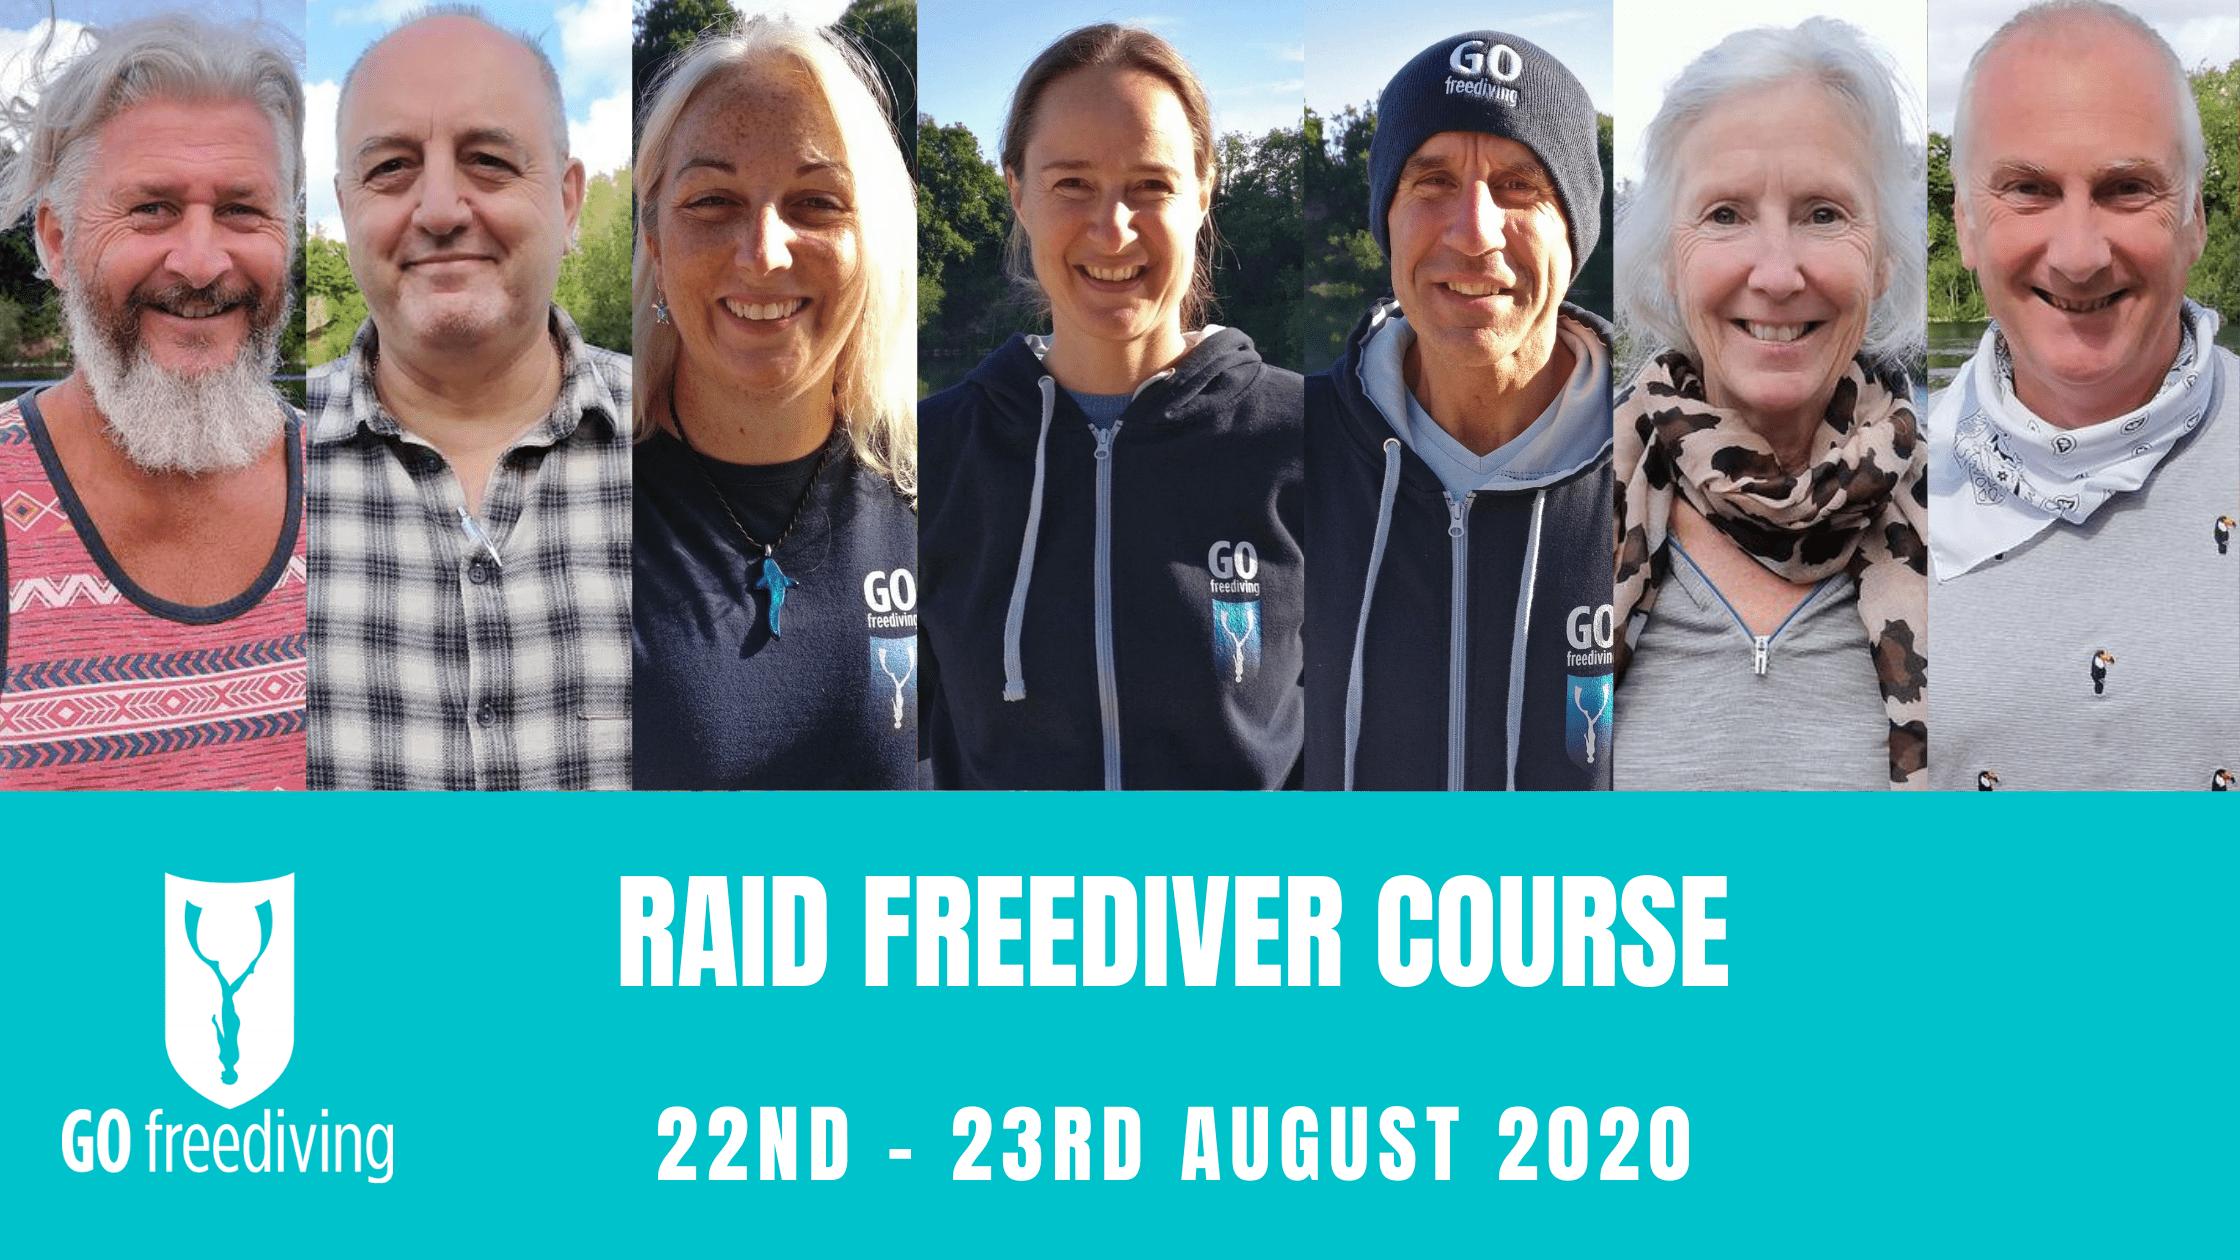 RAID Freediver Course 22 August 2020